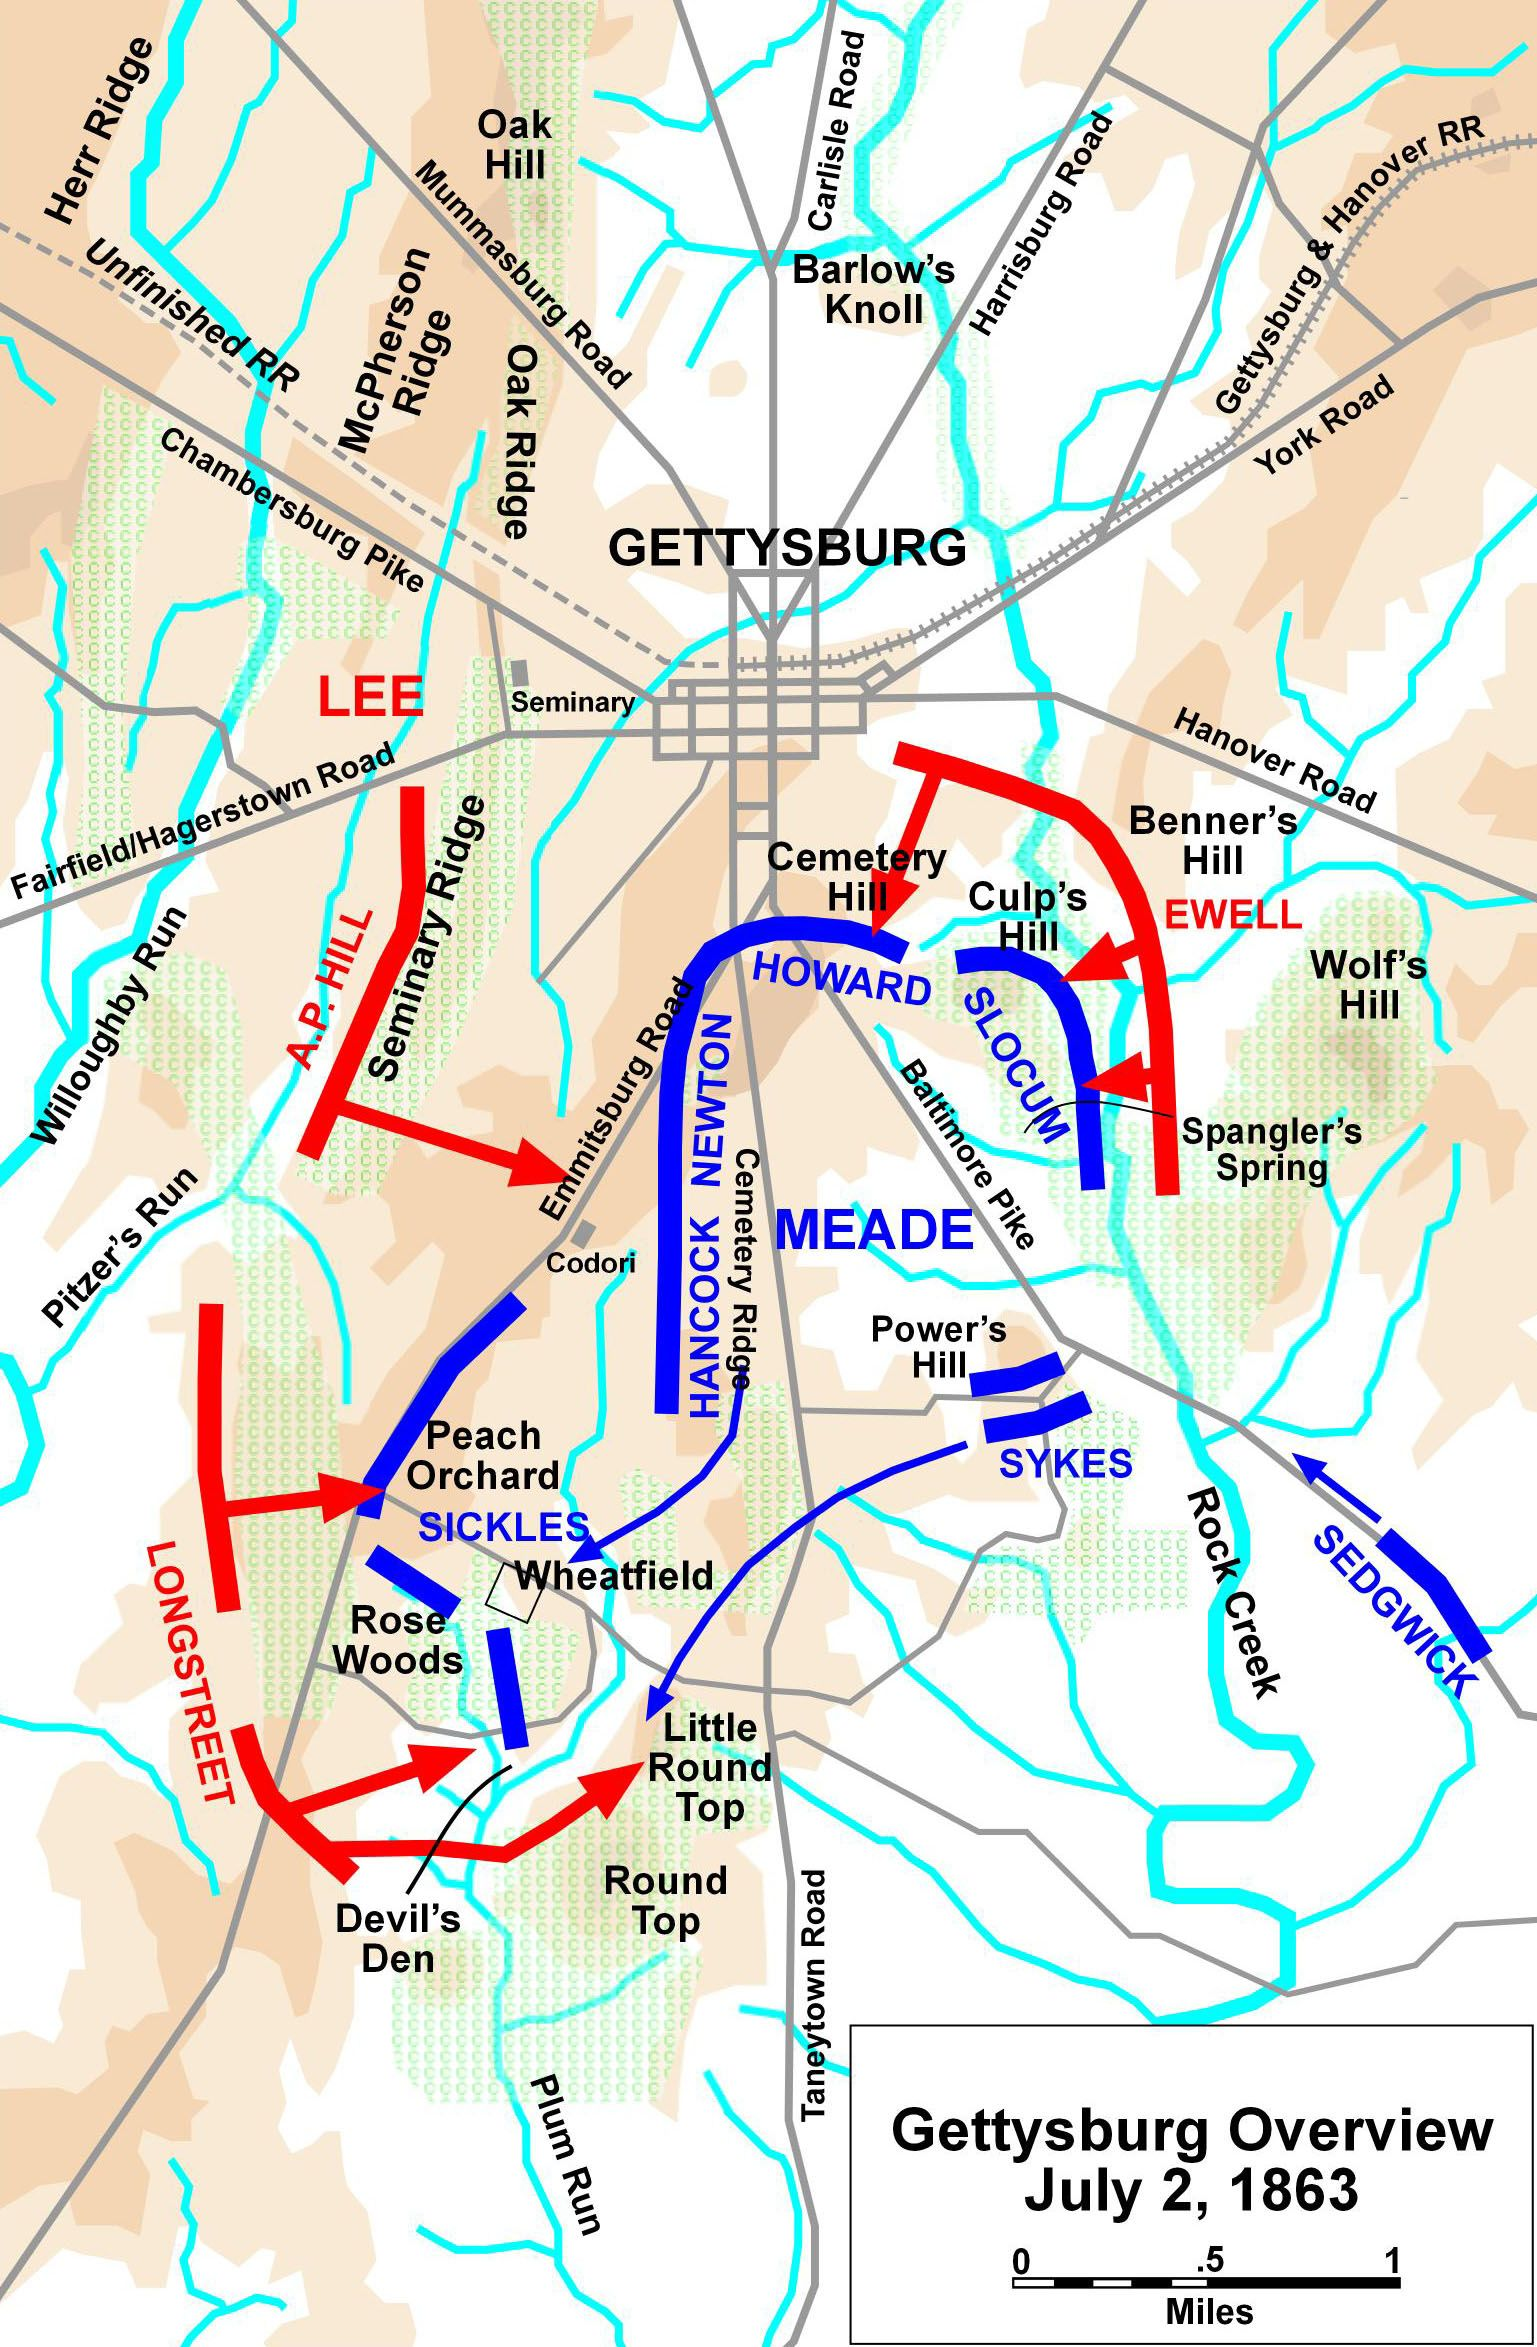 Battle Of Gettysburg July 2 1863 Gettysburg The Iron Brigade - Gettysburg-on-us-map